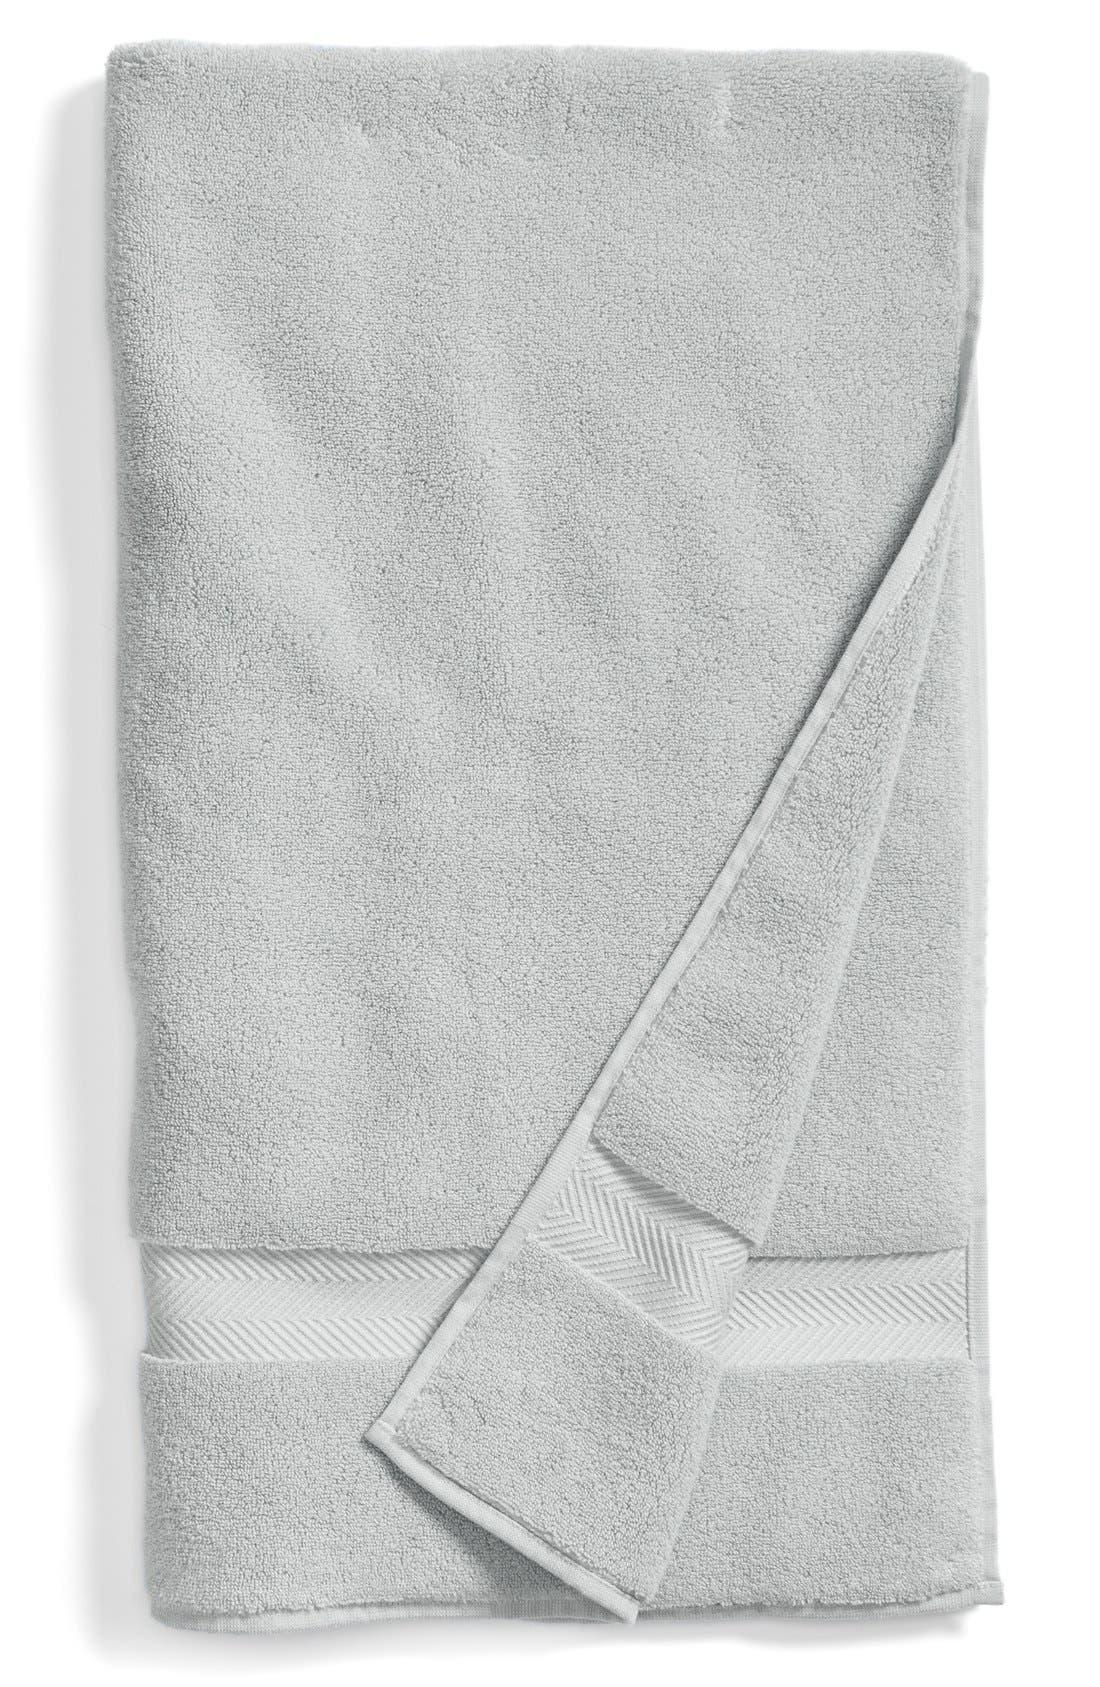 Hydrocotton Bath Towel,                             Main thumbnail 1, color,                             Grey Vapor